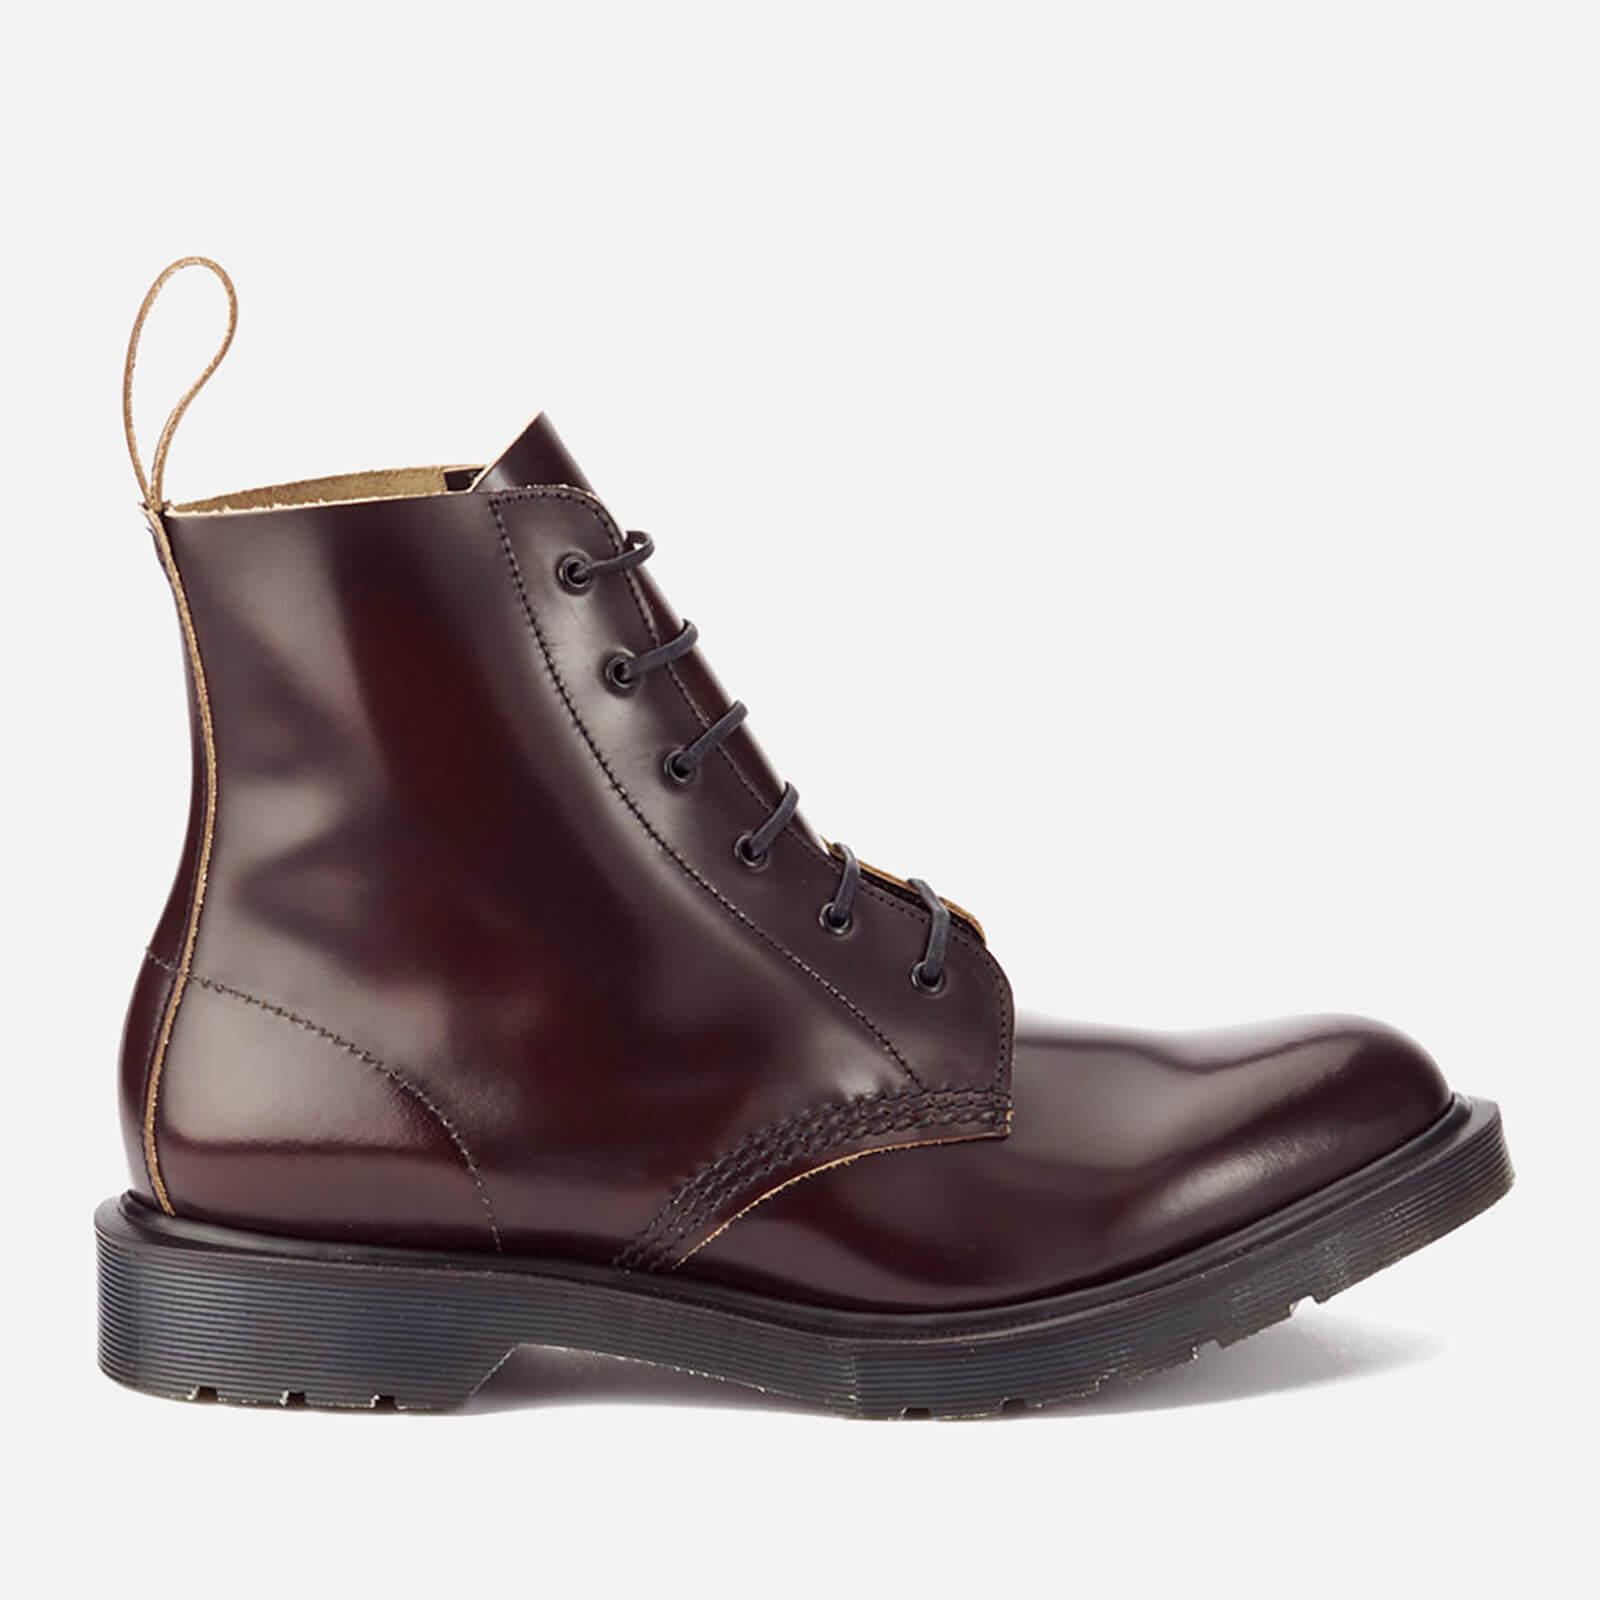 cb5f5a9b8da Dr. Martens Men's 'Made in England' Arthur Leather 6-Eye Boots - Merlot  Boanil Brush